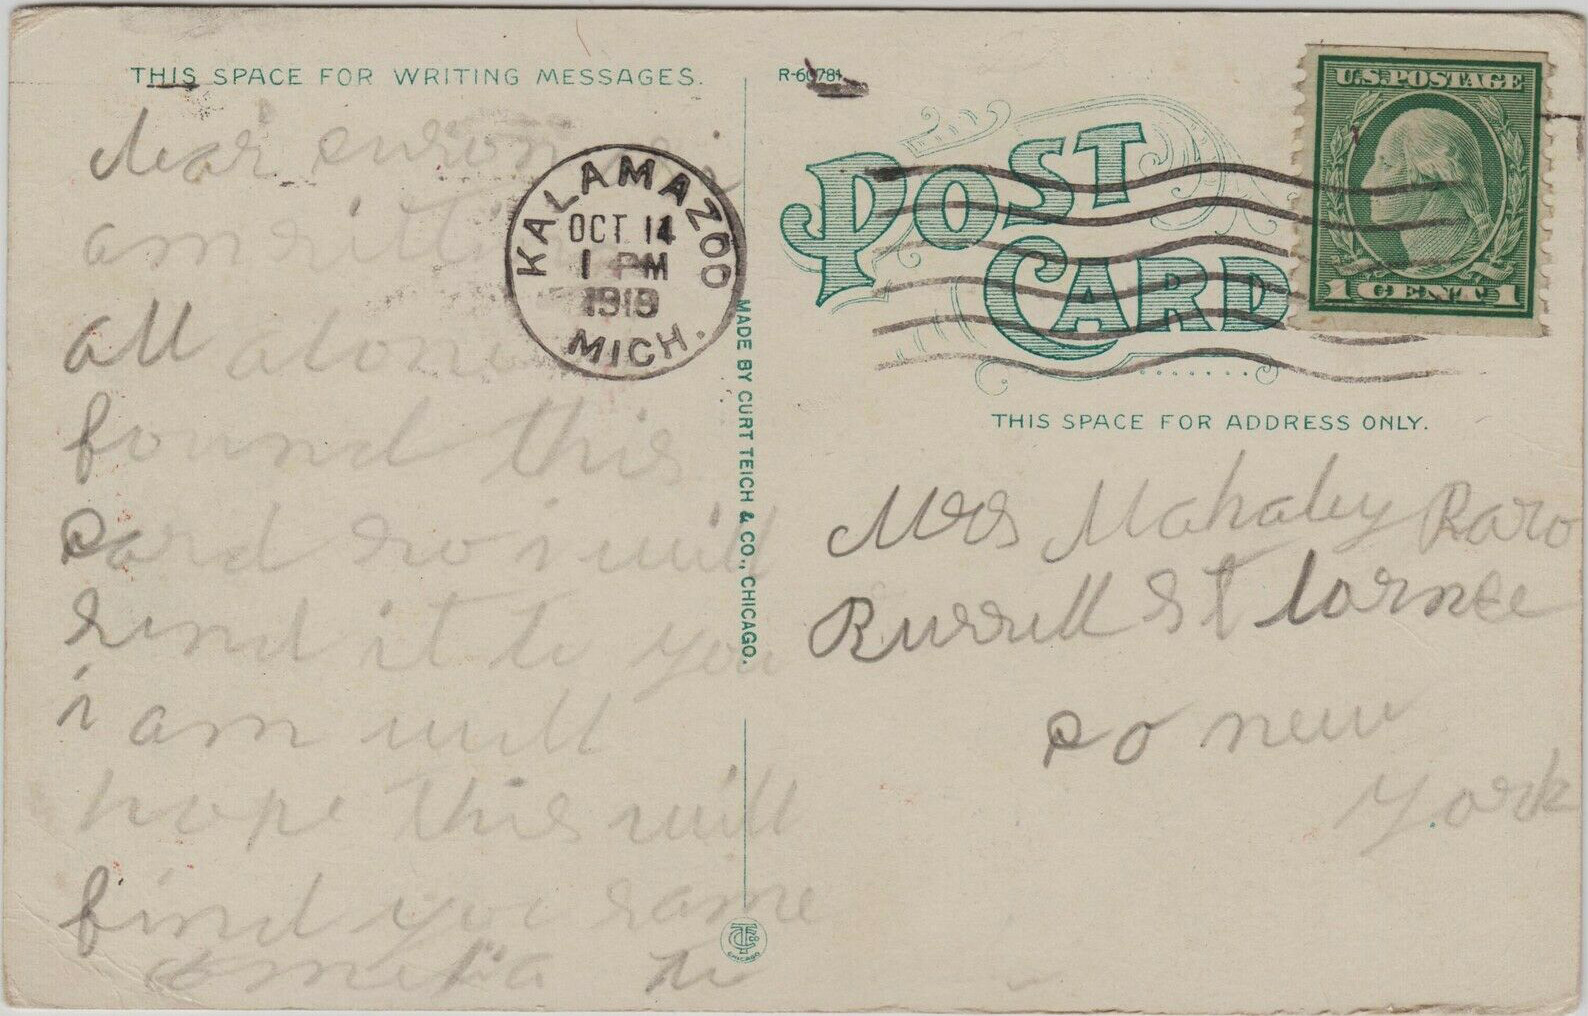 Niagara Scooter, Auto Wheel, Fleetwing, postcard (Buffalo Sled Co., 1919-10-14) 2.jpg